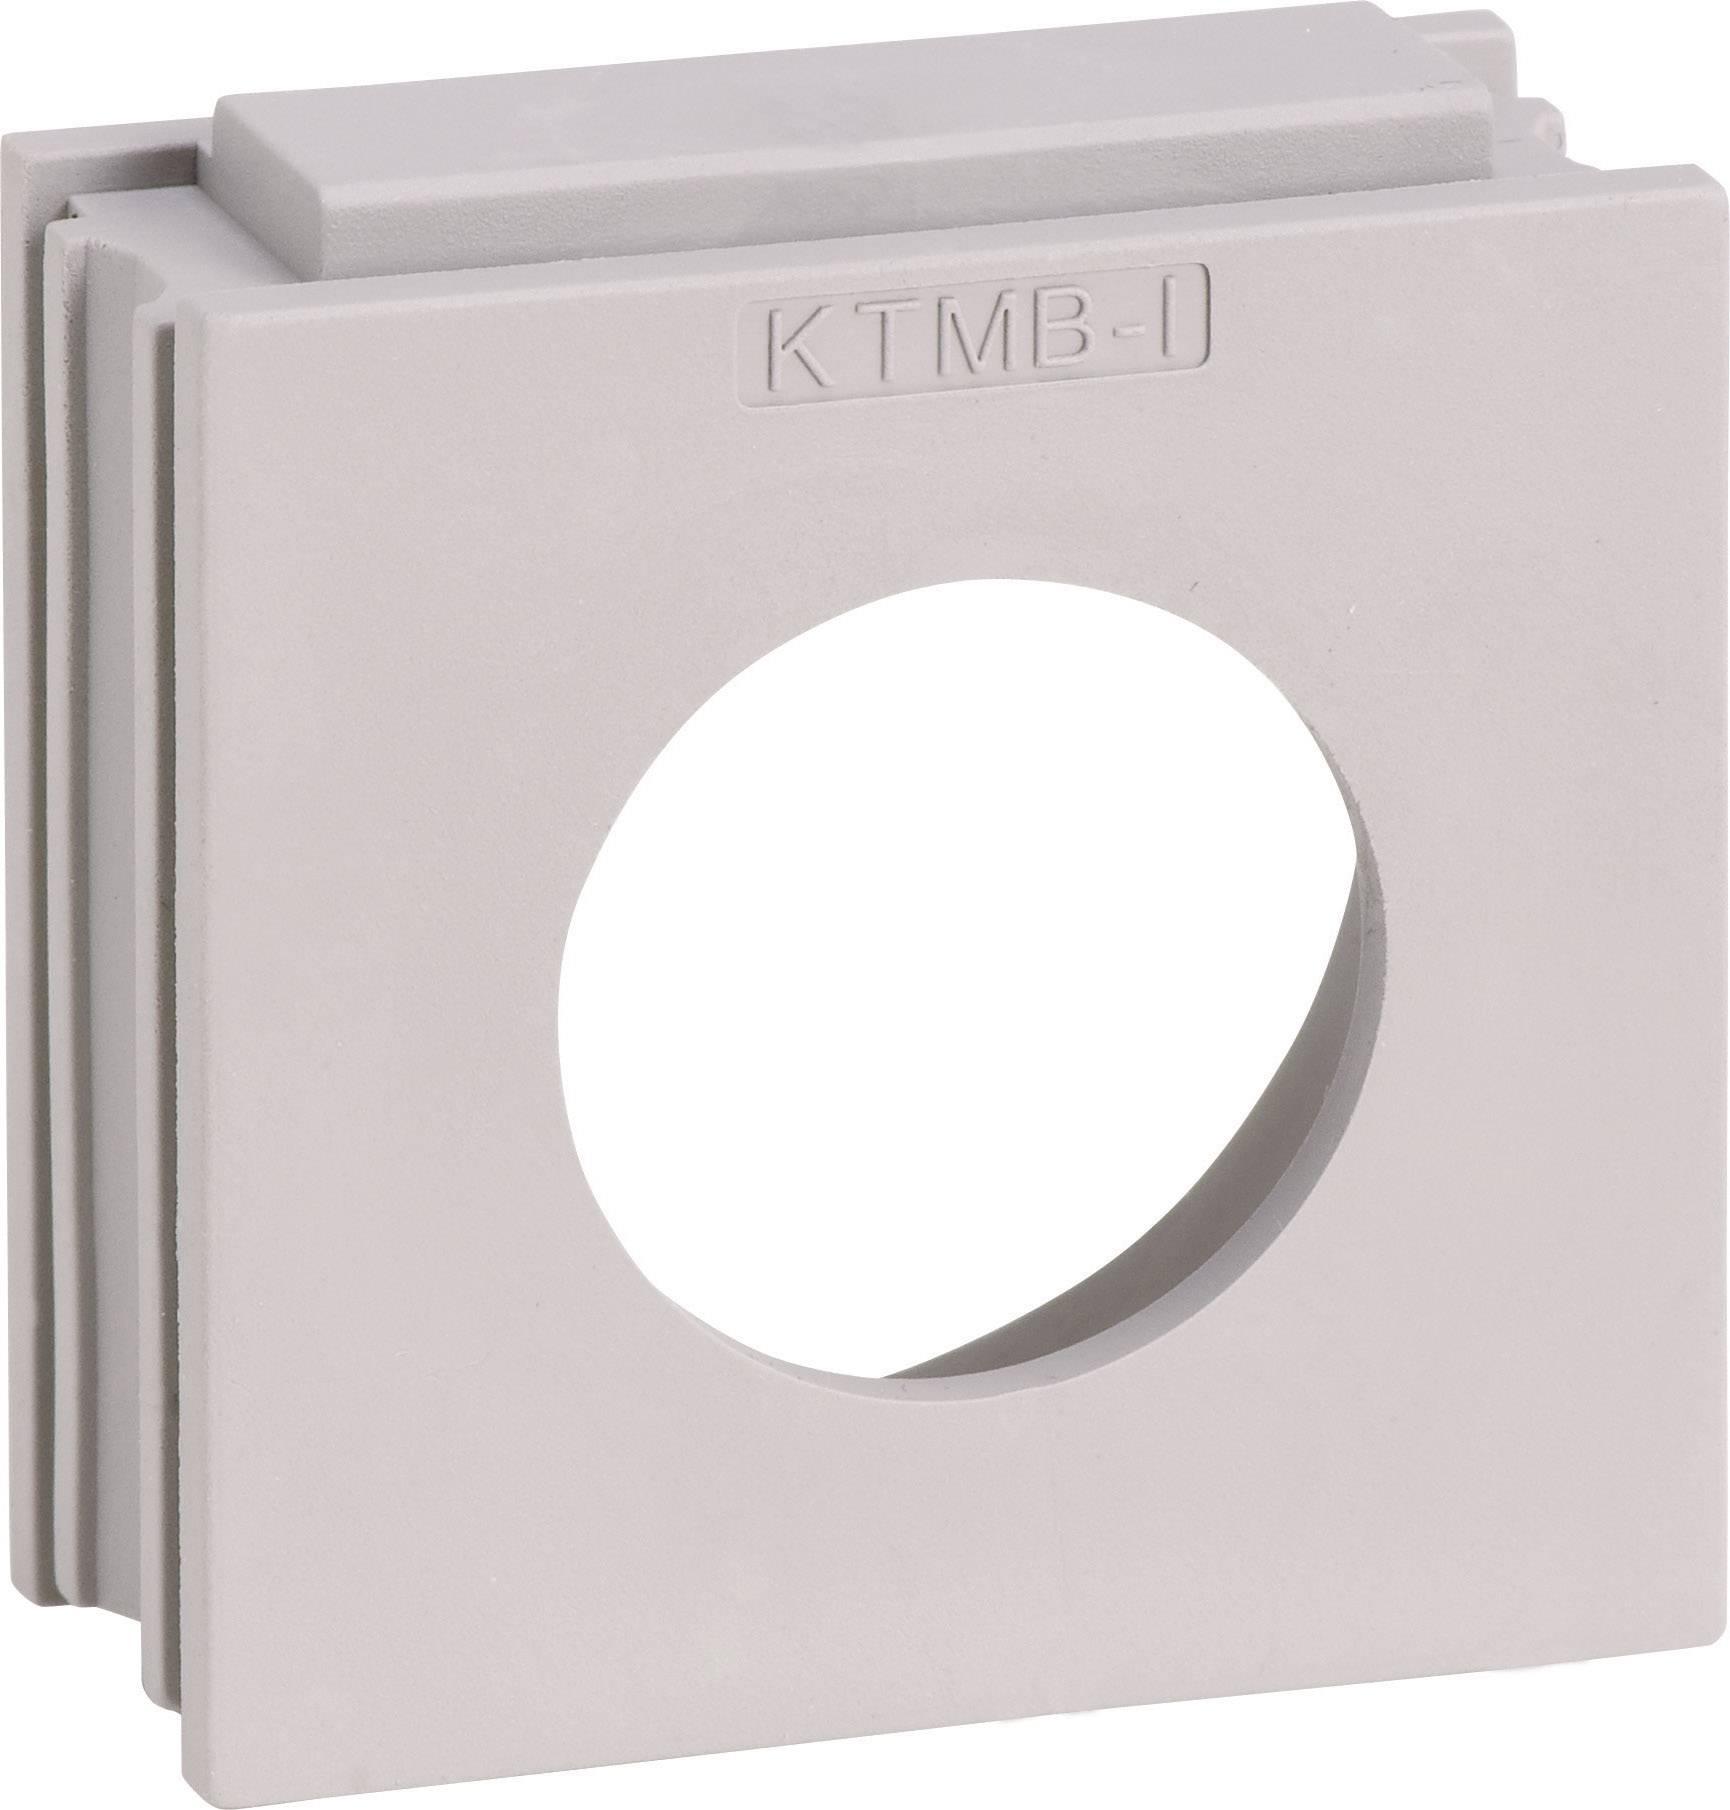 Icotek Kabelska kapa KTMB KTMB-G za kabel- 13 - 18 mm, elastomer, siva